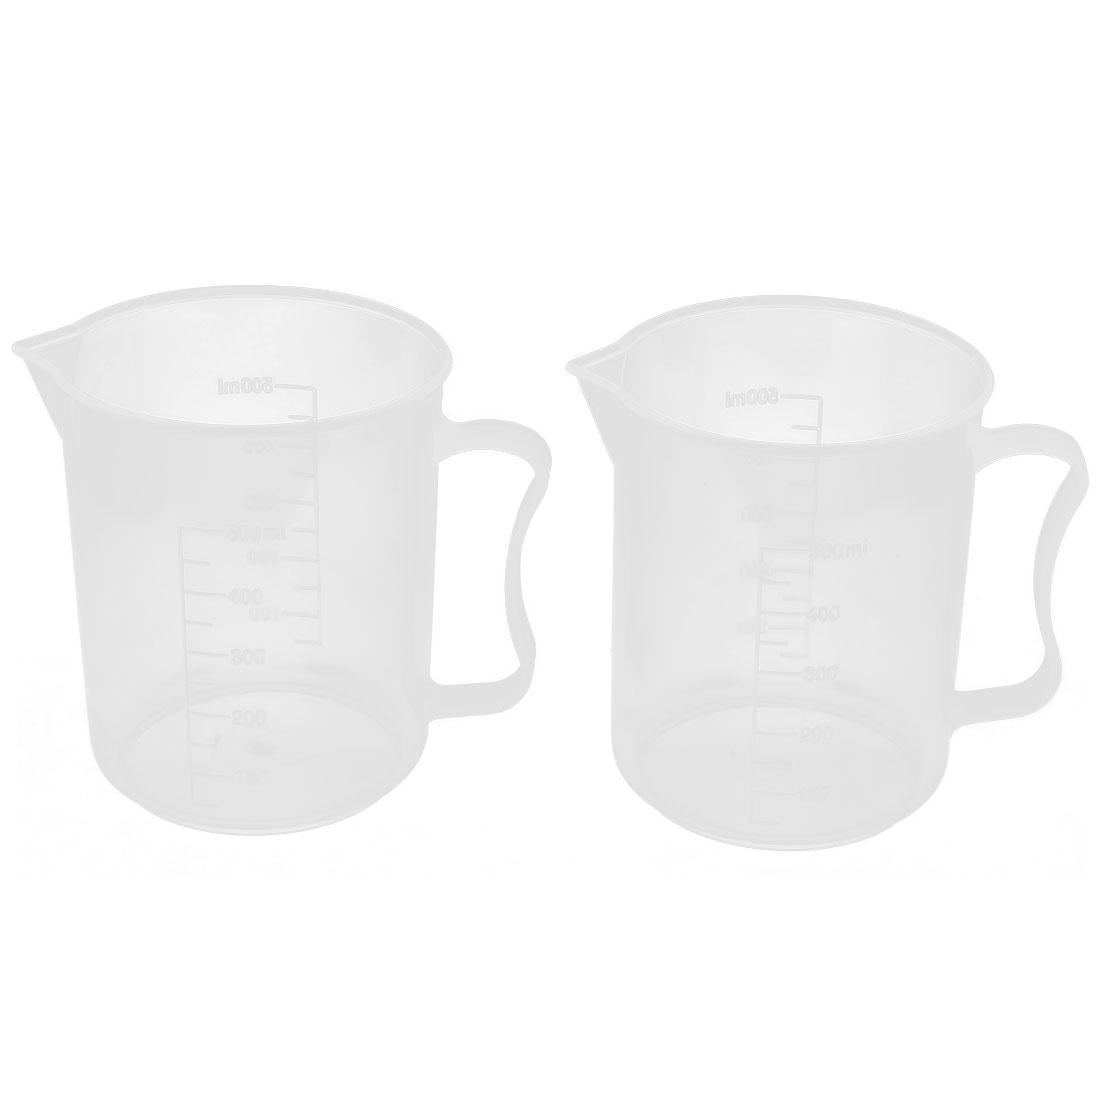 Lab Chemistry Experiment Liquid Storage Measuring Testing Beaker Cup 500ml 2 Pcs